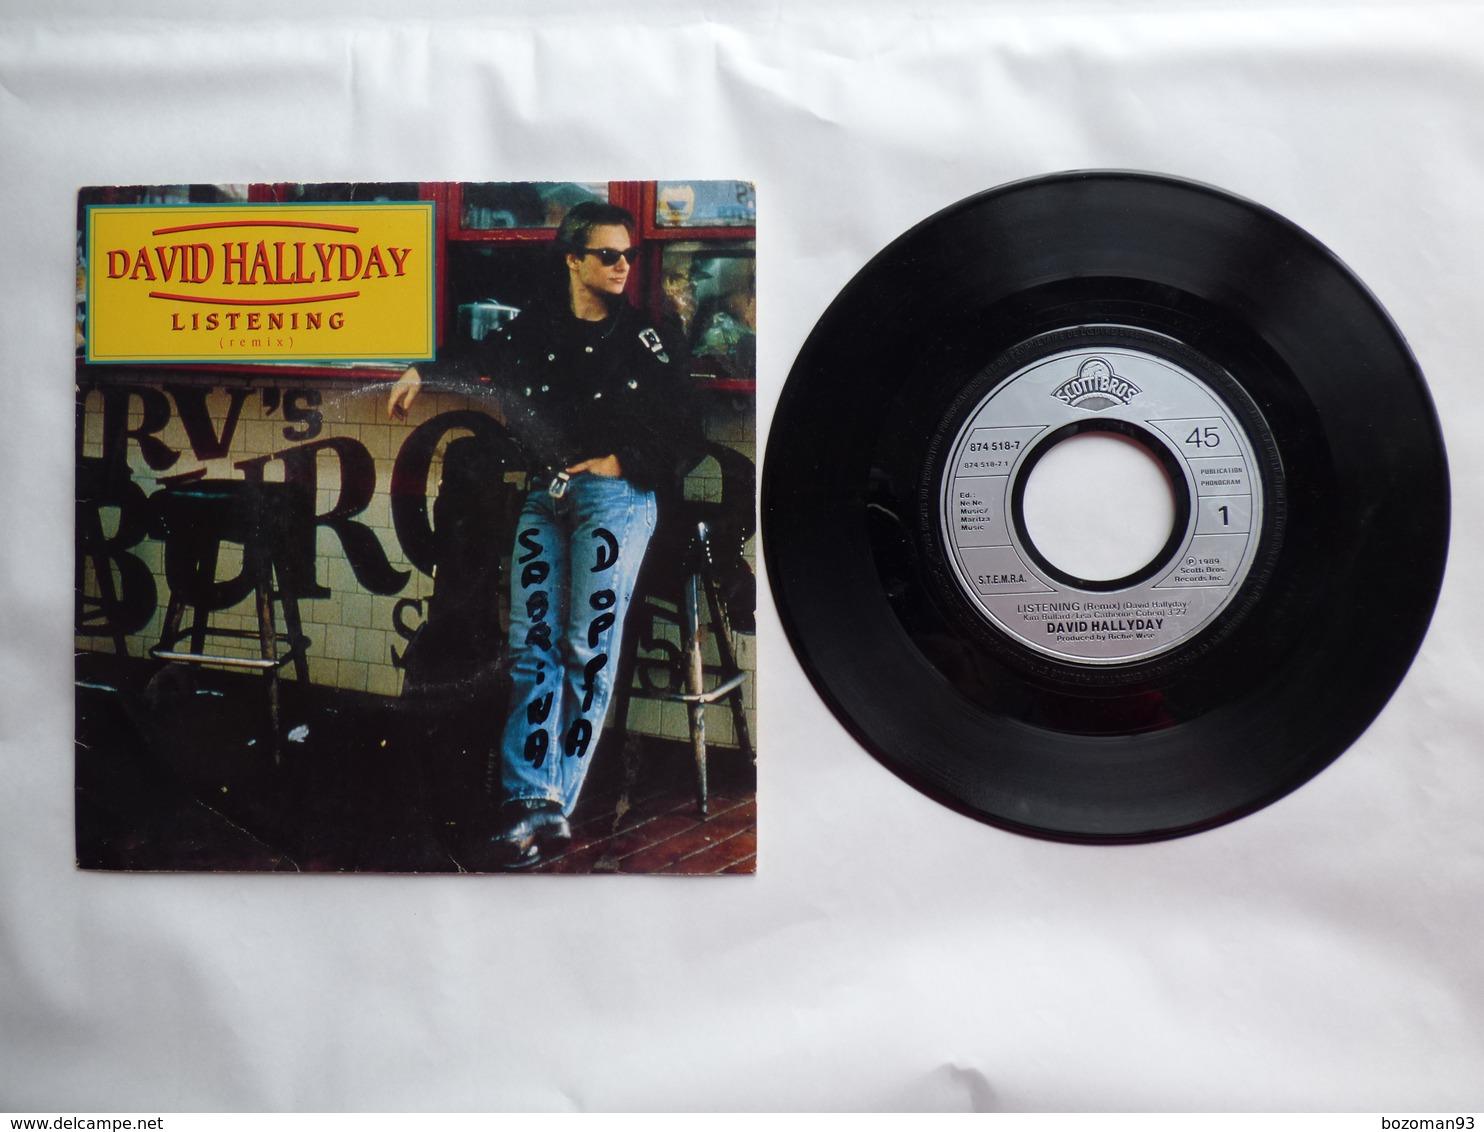 EP 45 T  DAVID HALLIDAY  LABEL SCOTTIBROS 874.518  LISTENING - Disco, Pop